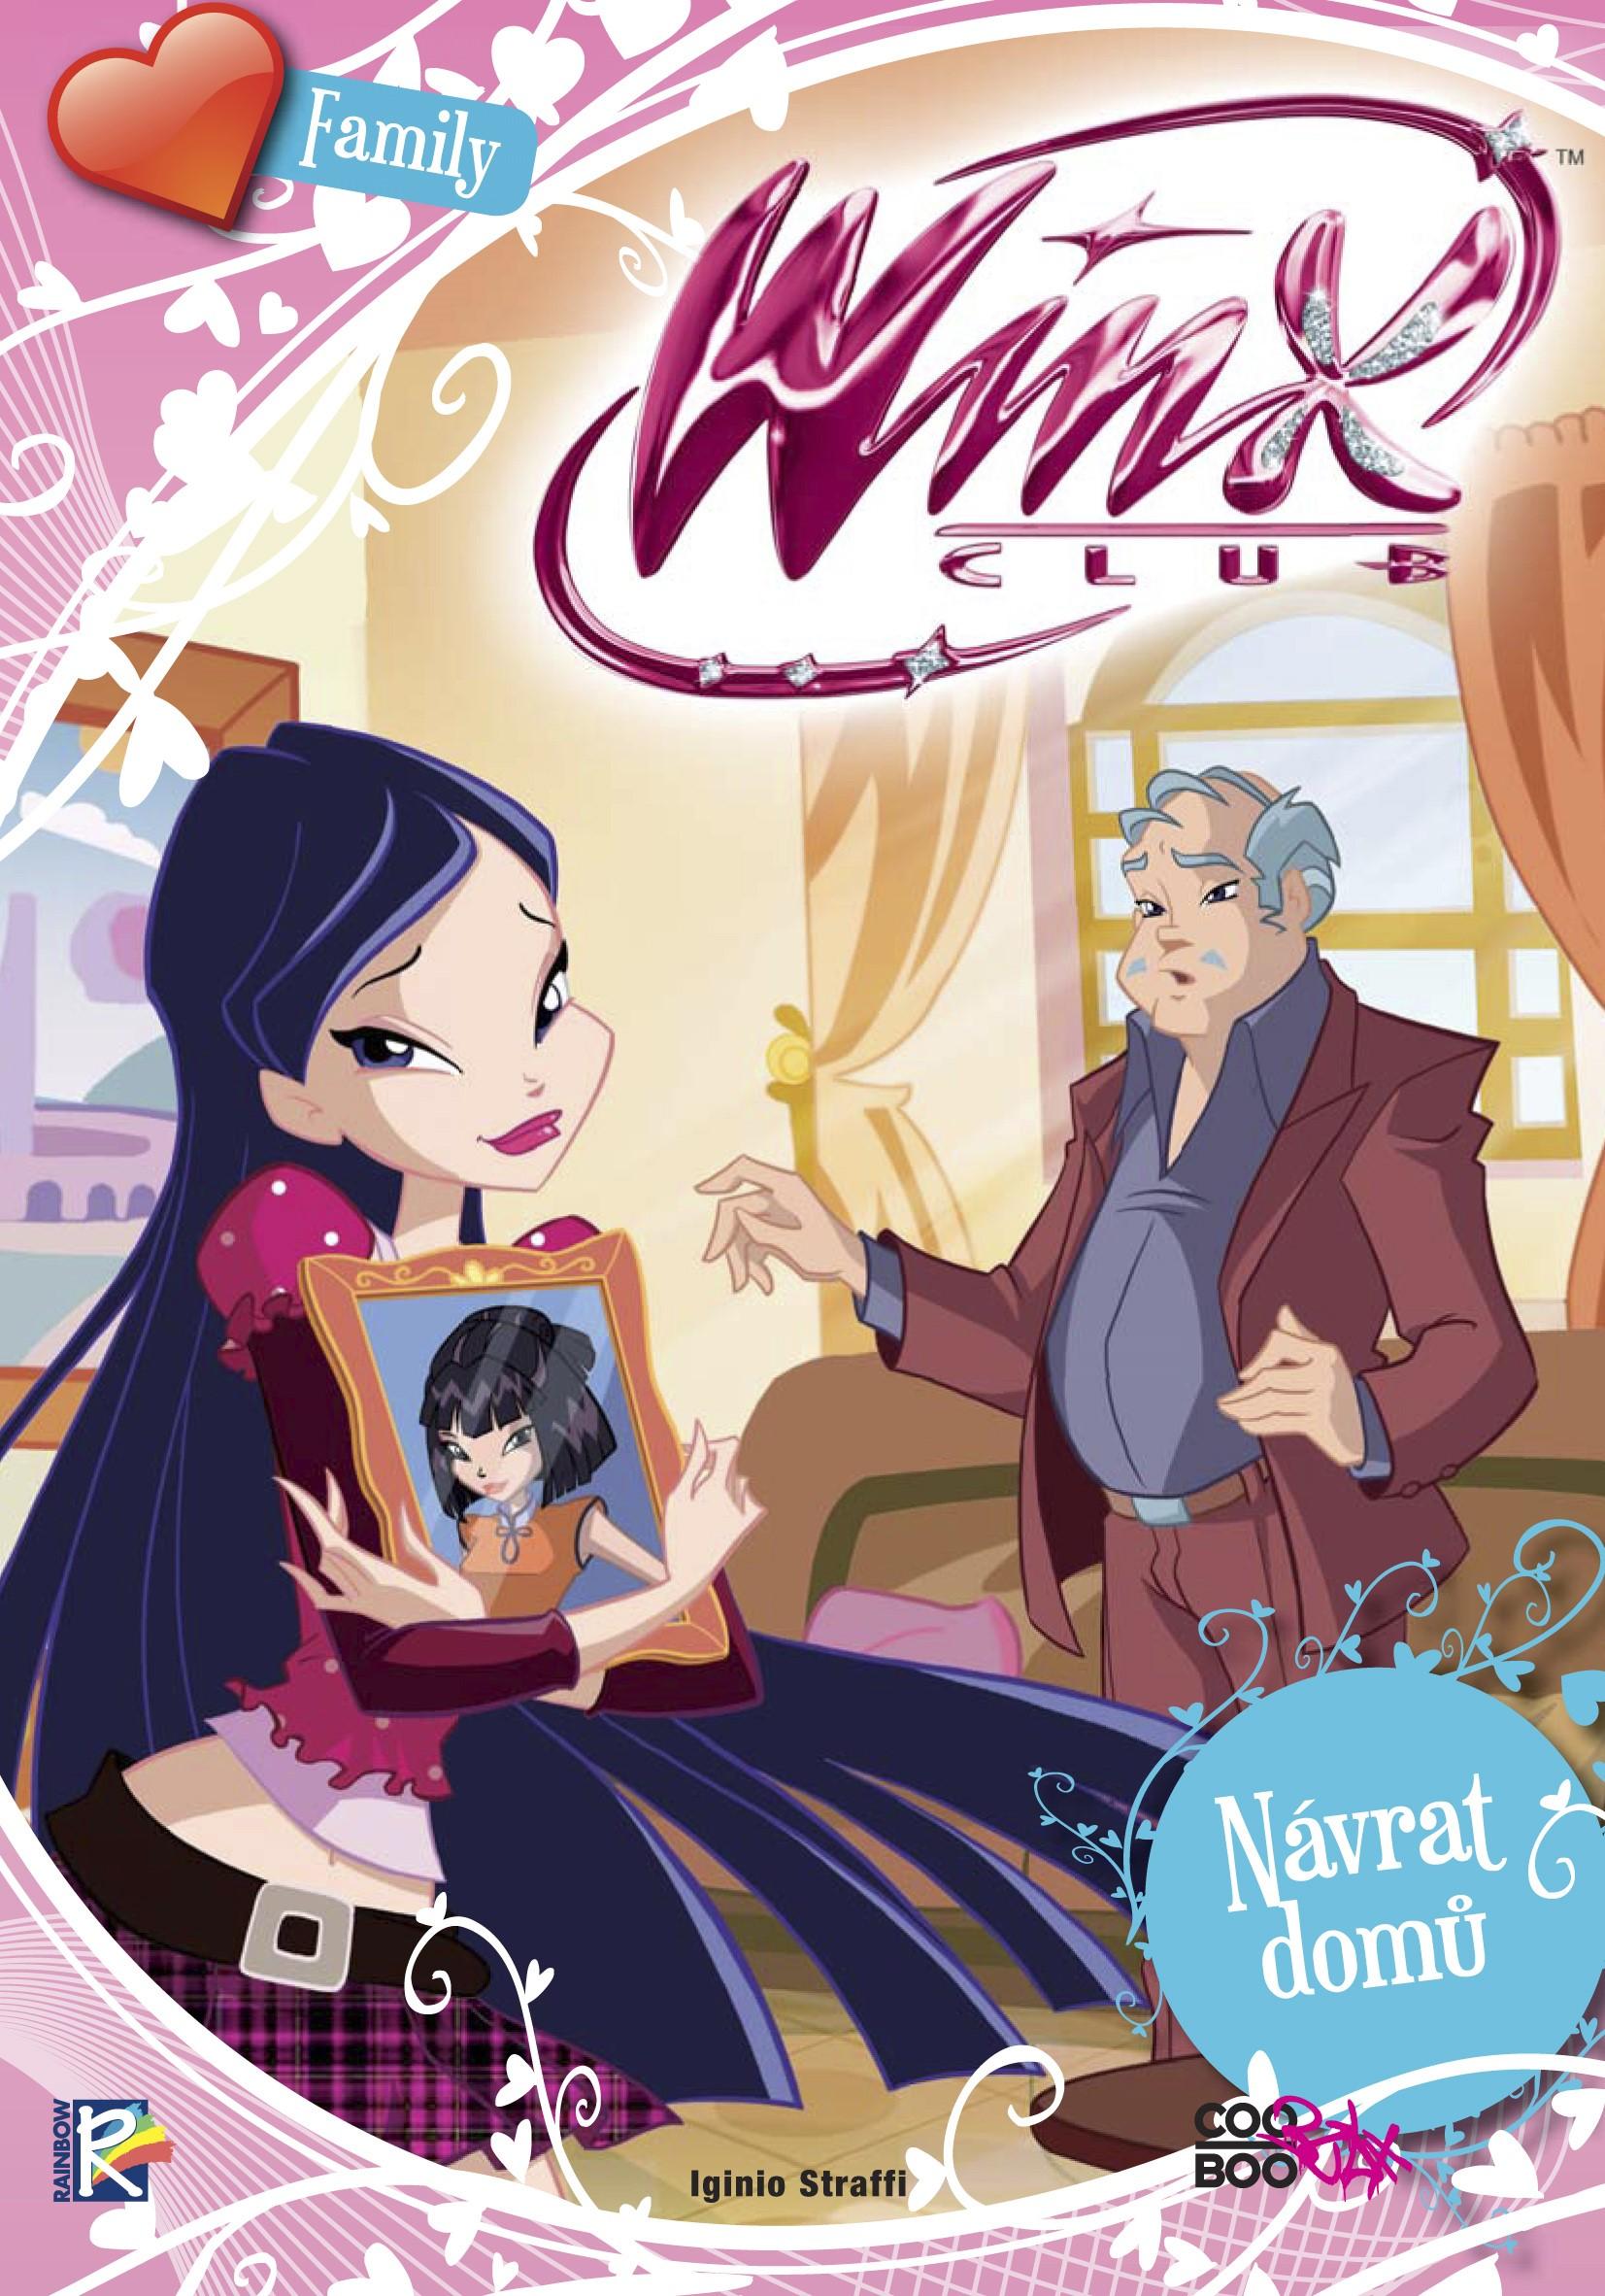 Winx Family - Návrat domů | Iginio Straffi